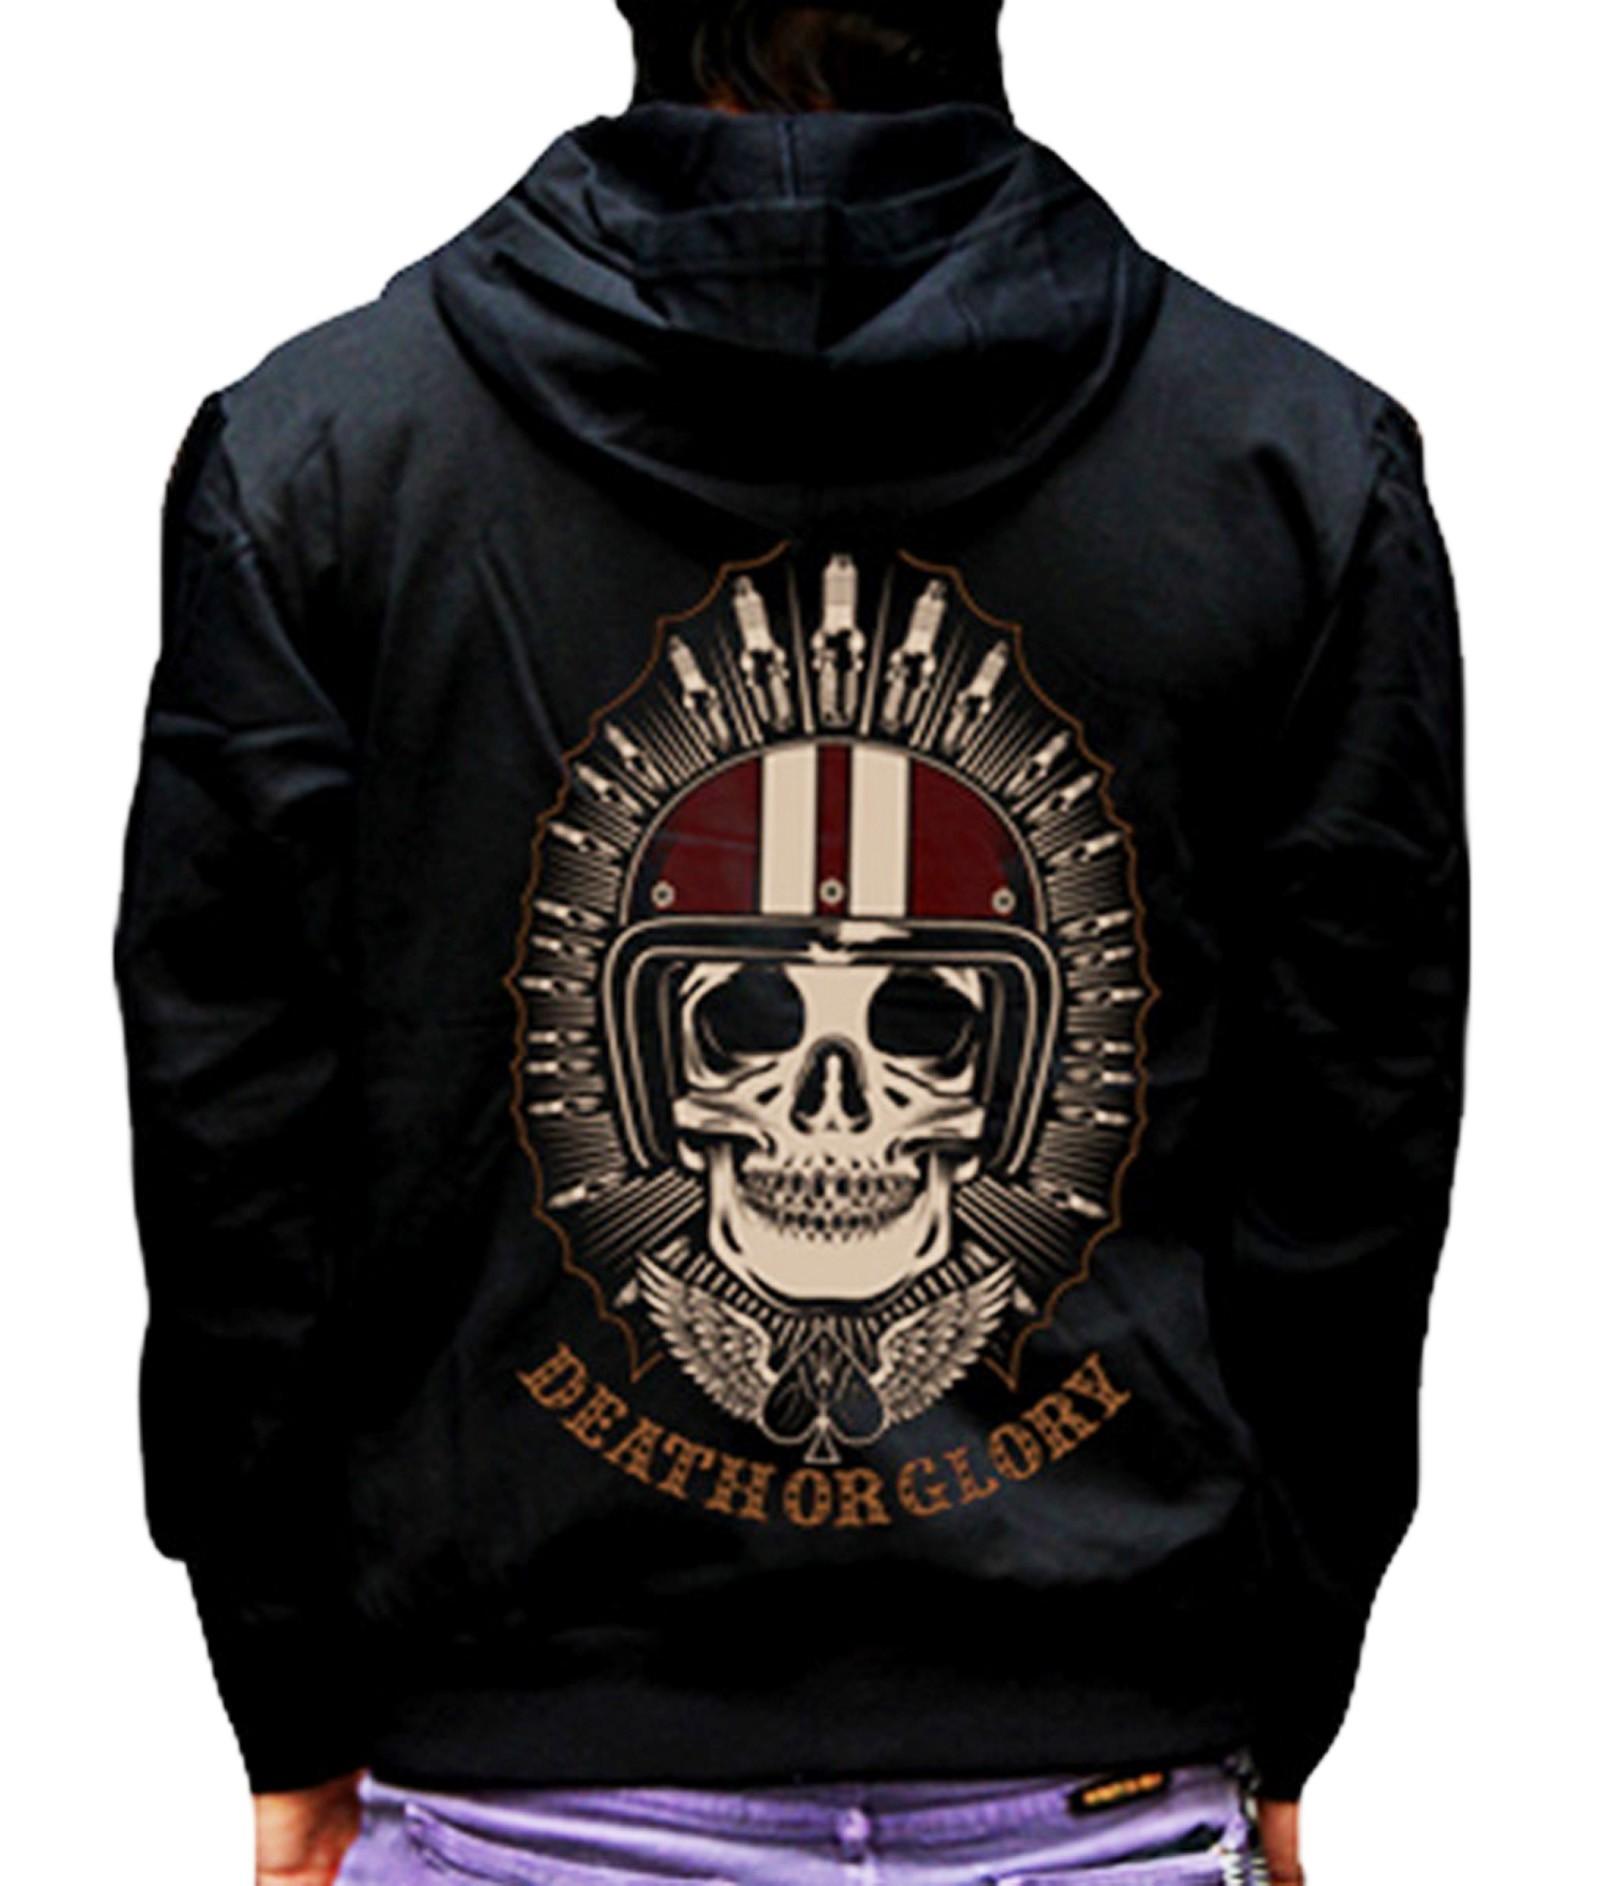 La Marca Del Diablo - Death Glory Zipper Hoodie Front